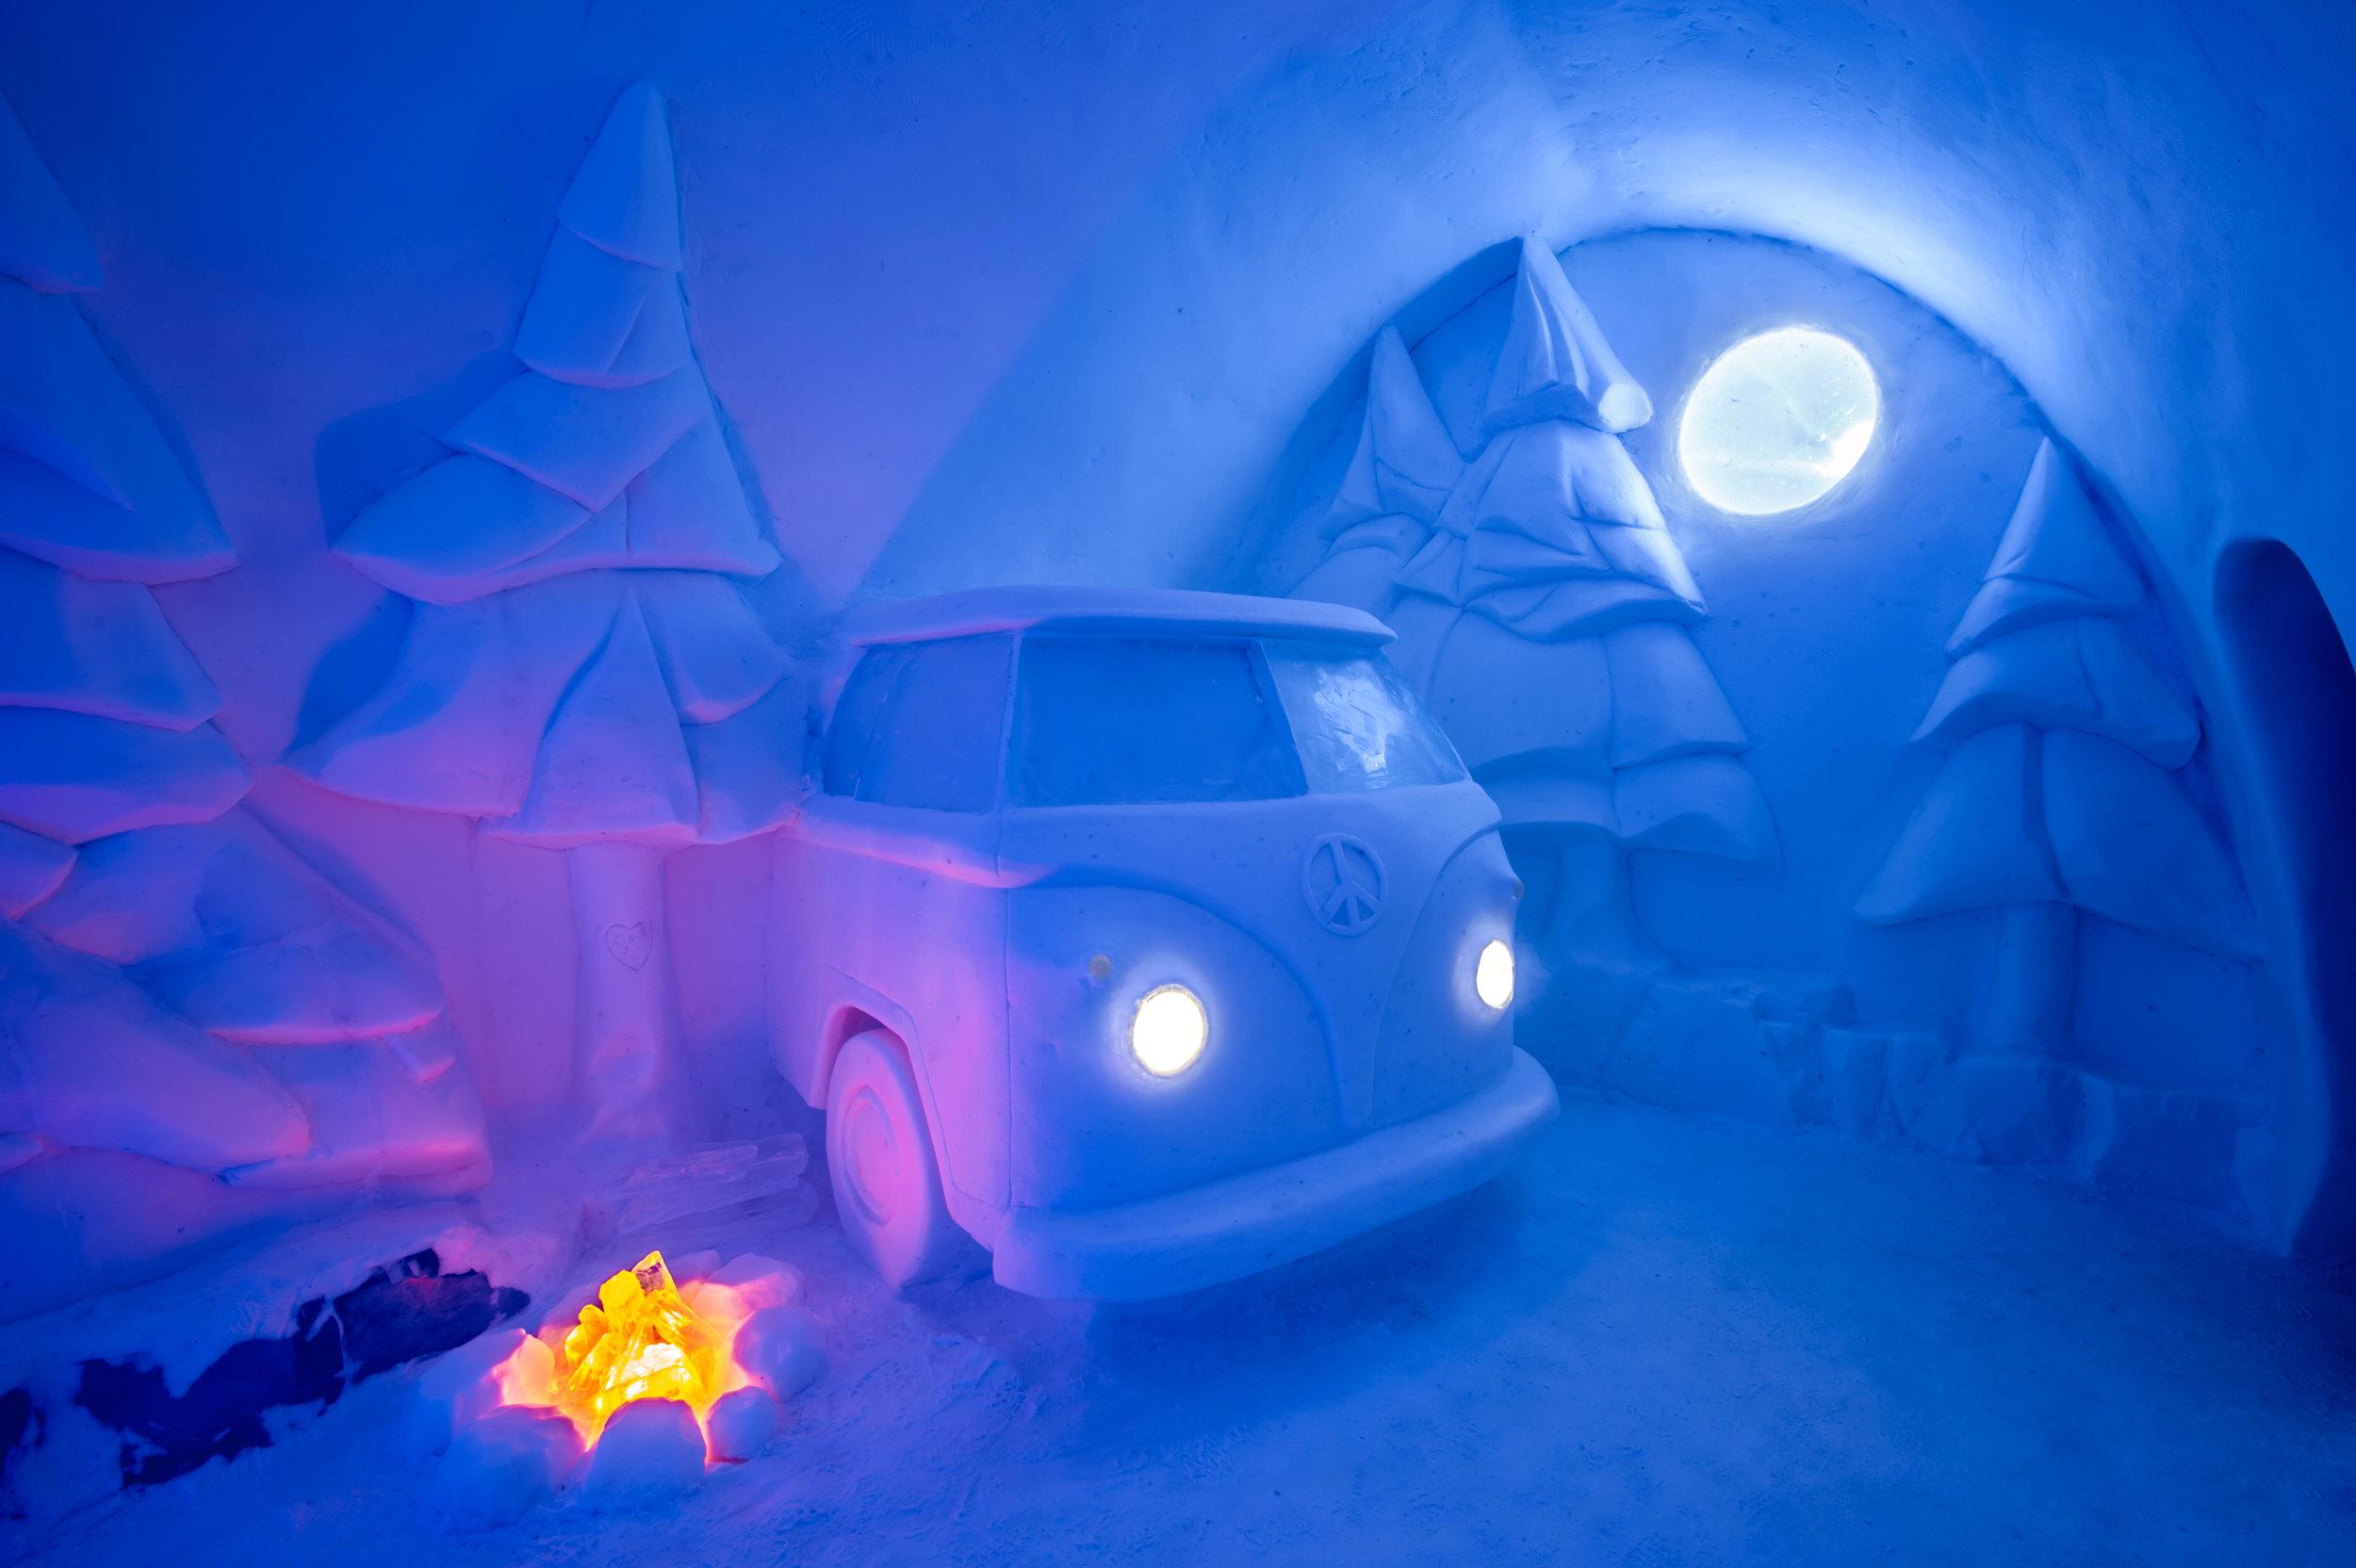 Icehotel #29- Art Suite 'Spruce Woods' by Christopher Pancoe & Jennie O'Keefe. Image by Asaf Kliger.jpg